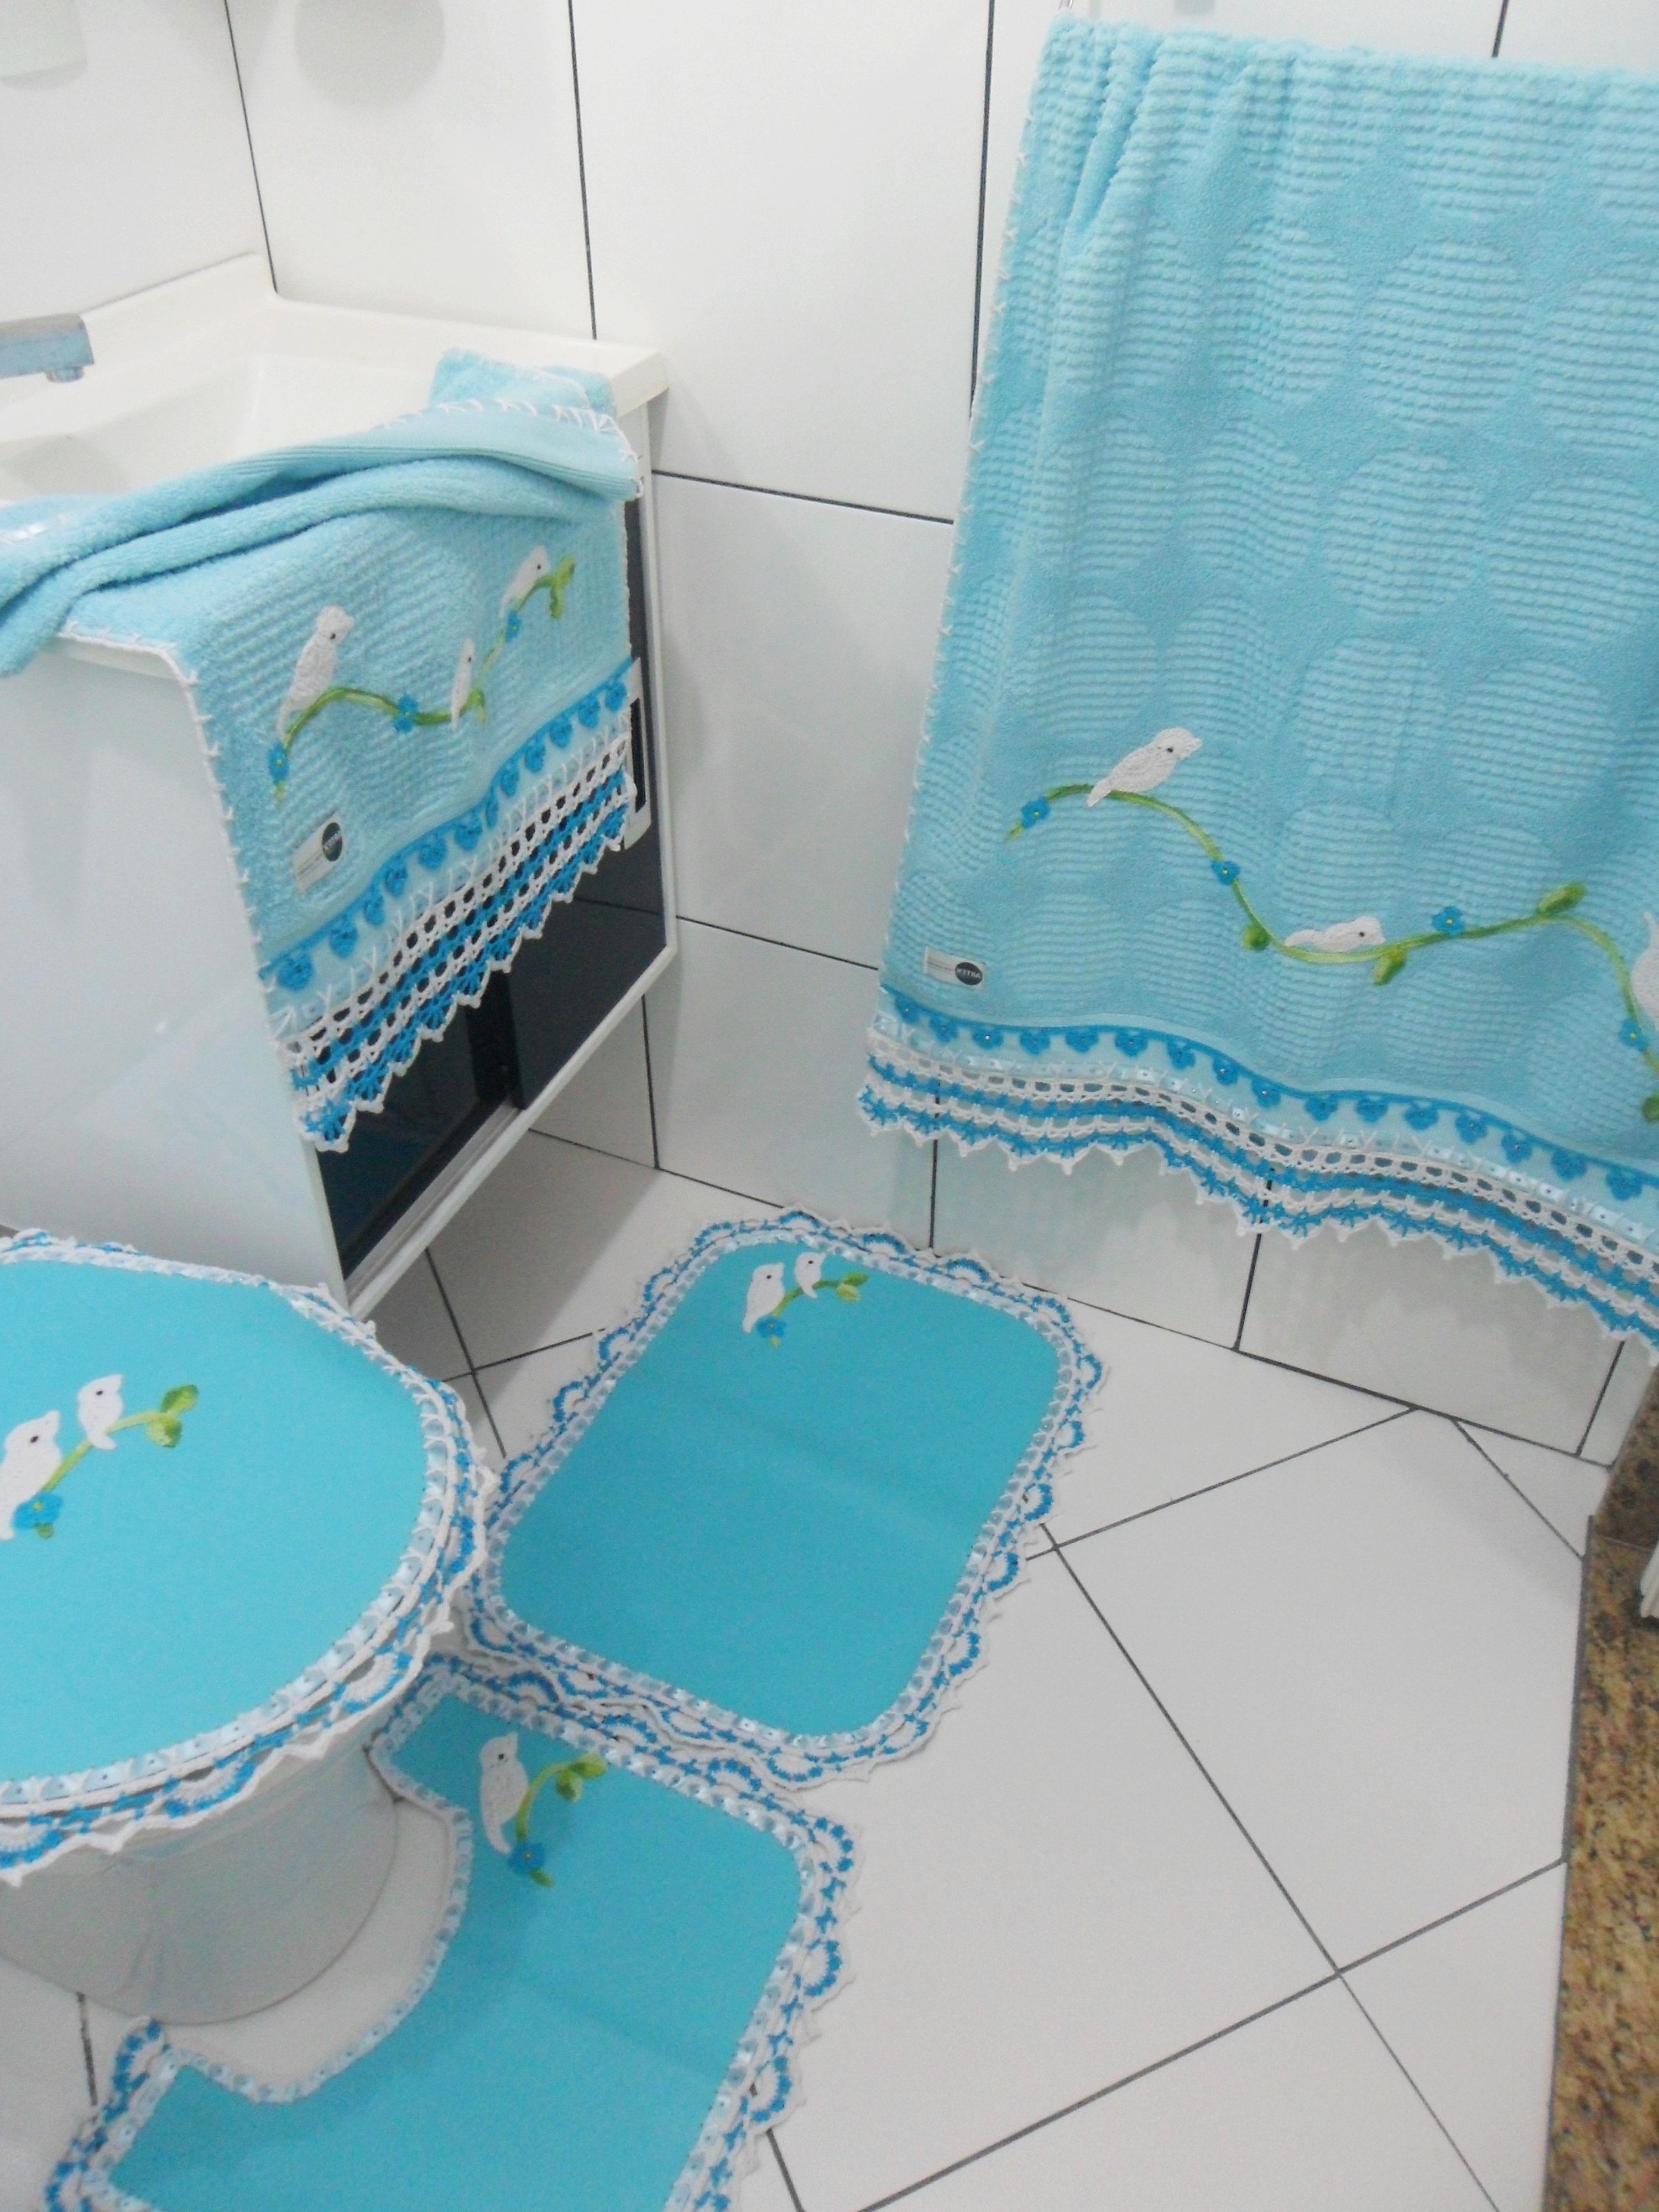 Jogo Banheiro Passarinho Azul Passaro Luxo Completo #348797 3000x4000 Banheiro Azul